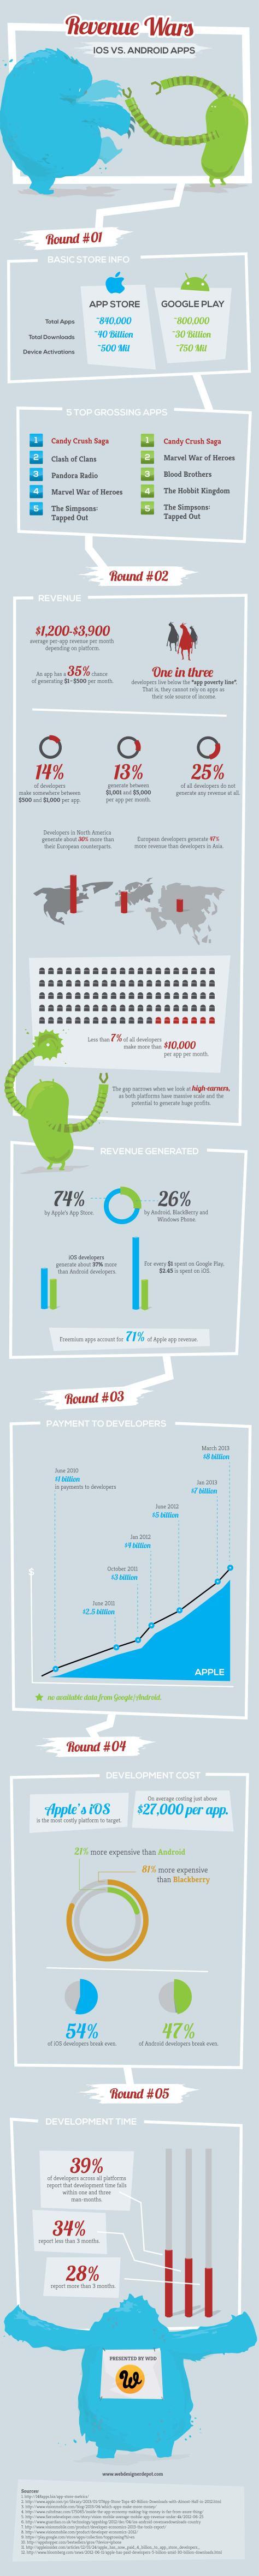 ios-vs-android-revenue-wars_518a4edb39113